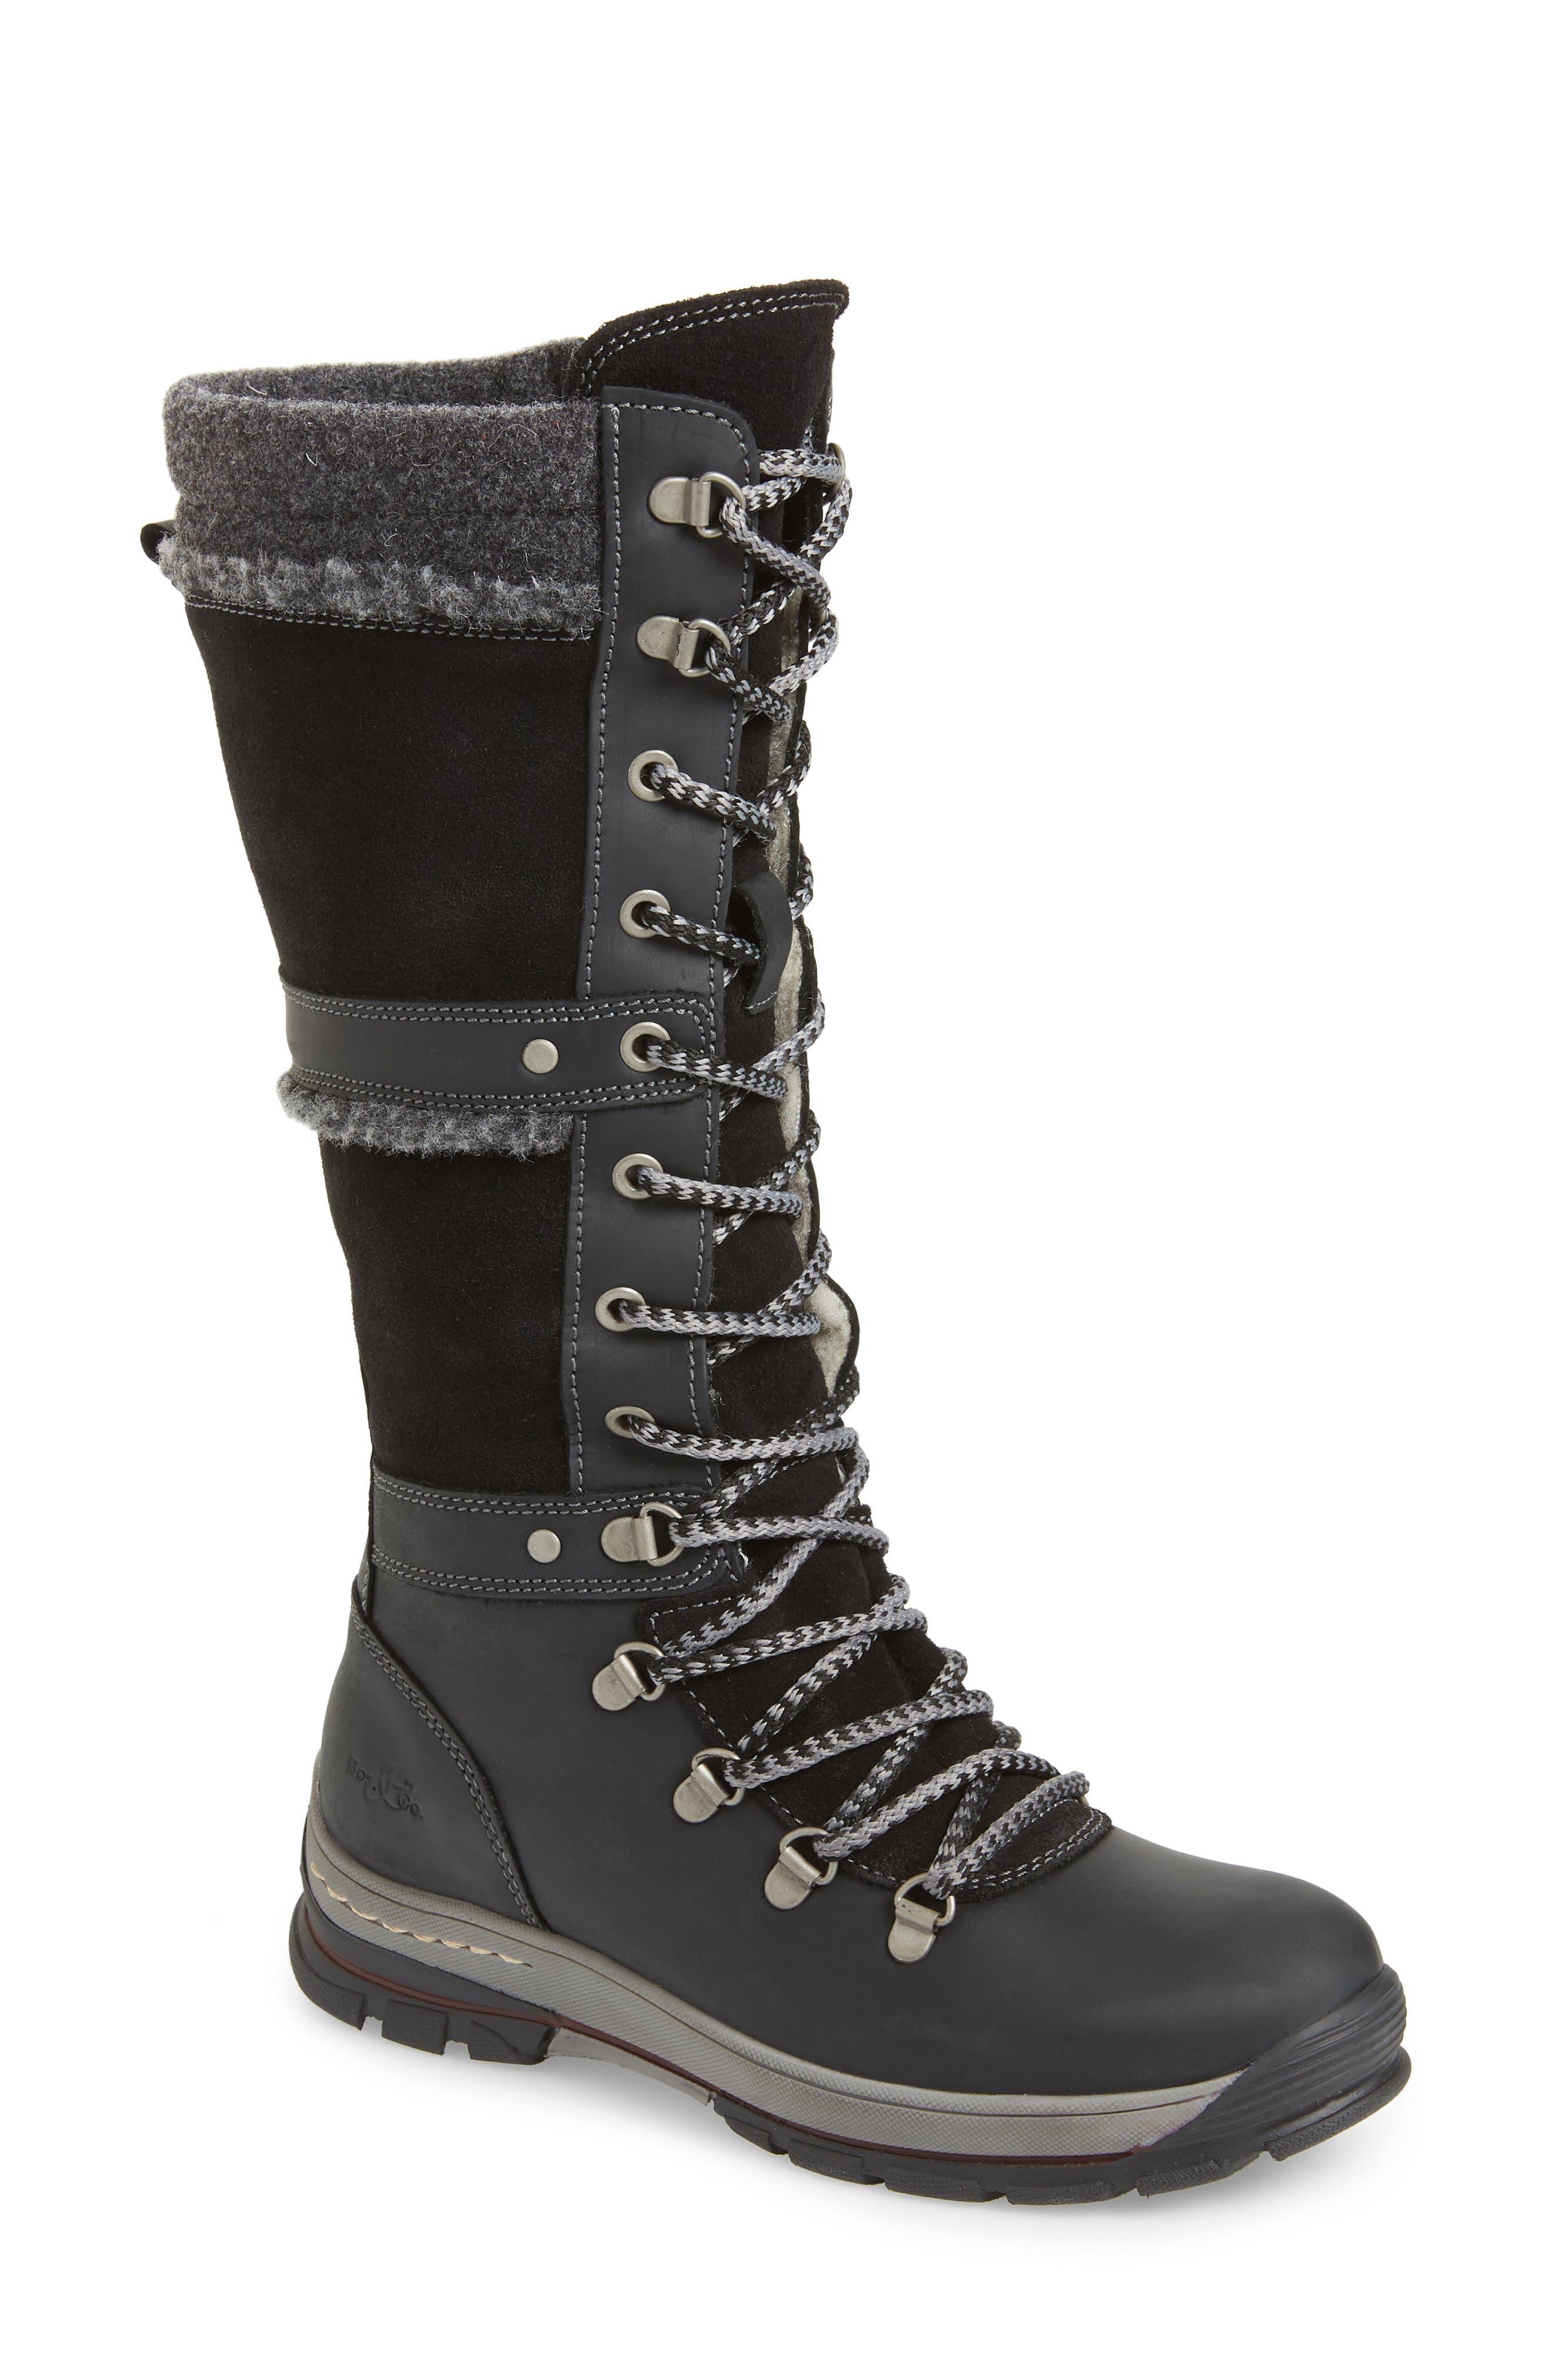 Bos. & Co. Gabriella Waterproof Boot - Black